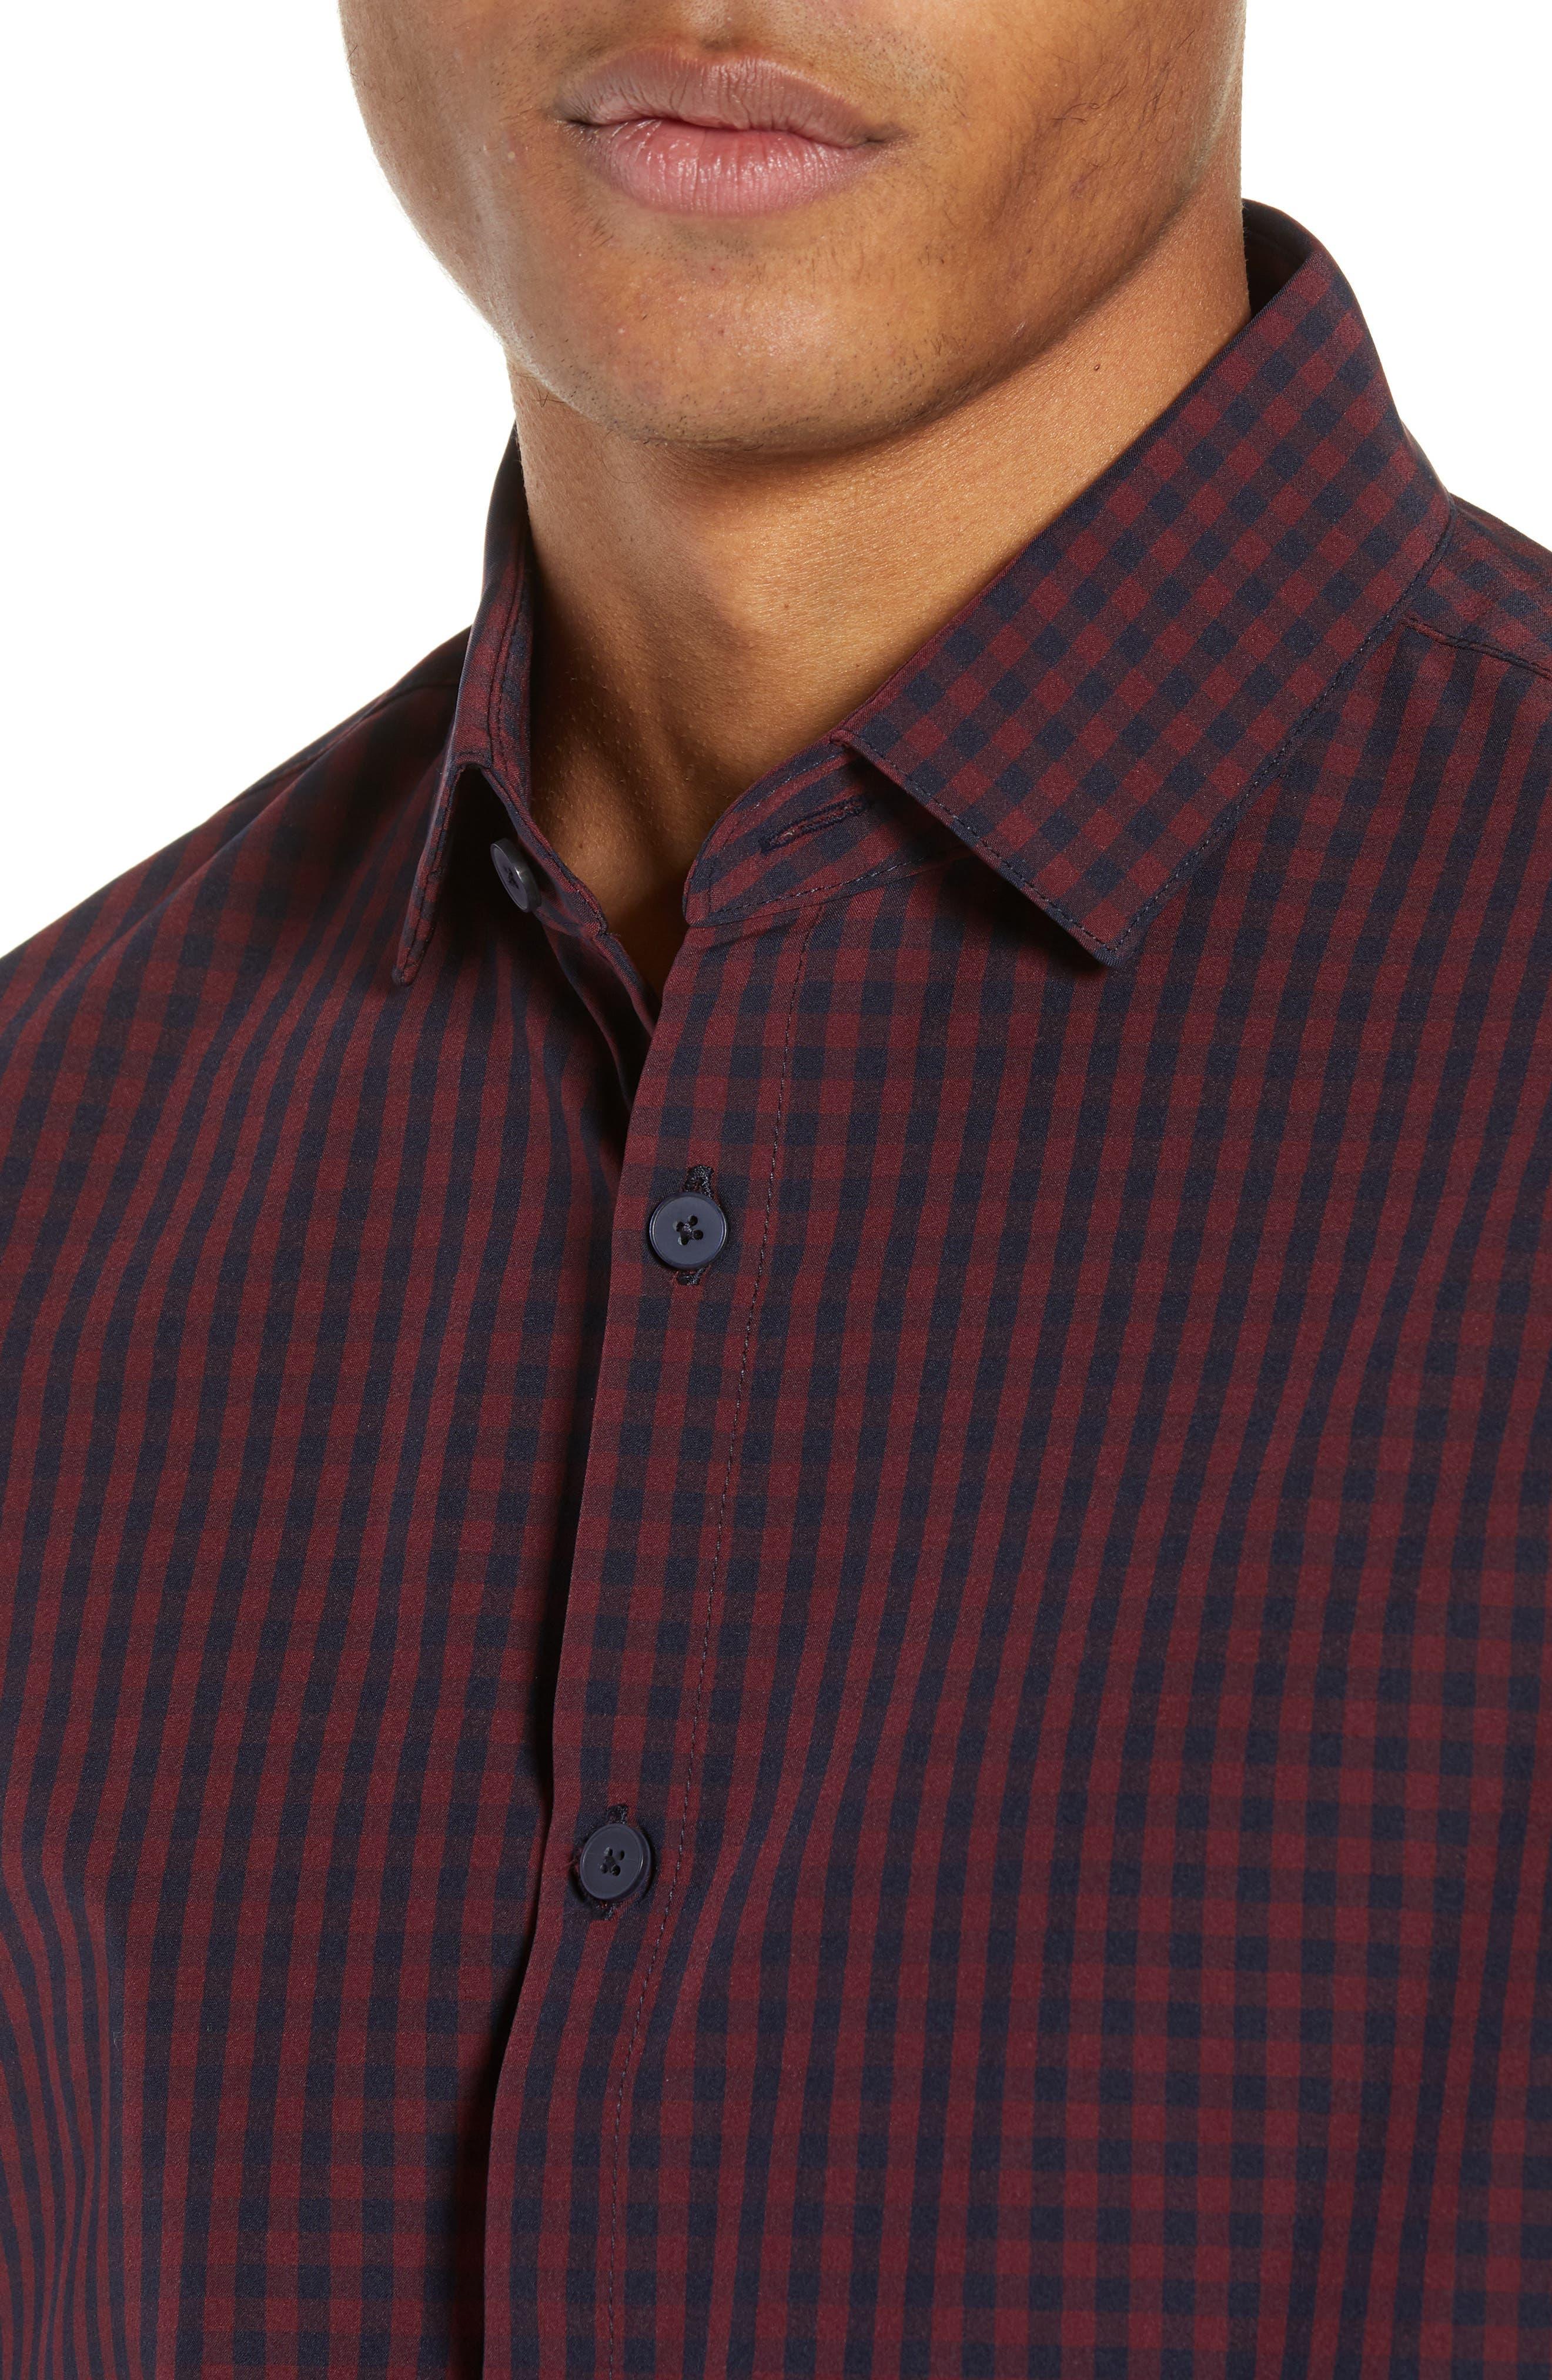 MIZZEN+MAIN, Marshall Check Sport Shirt, Alternate thumbnail 2, color, 930